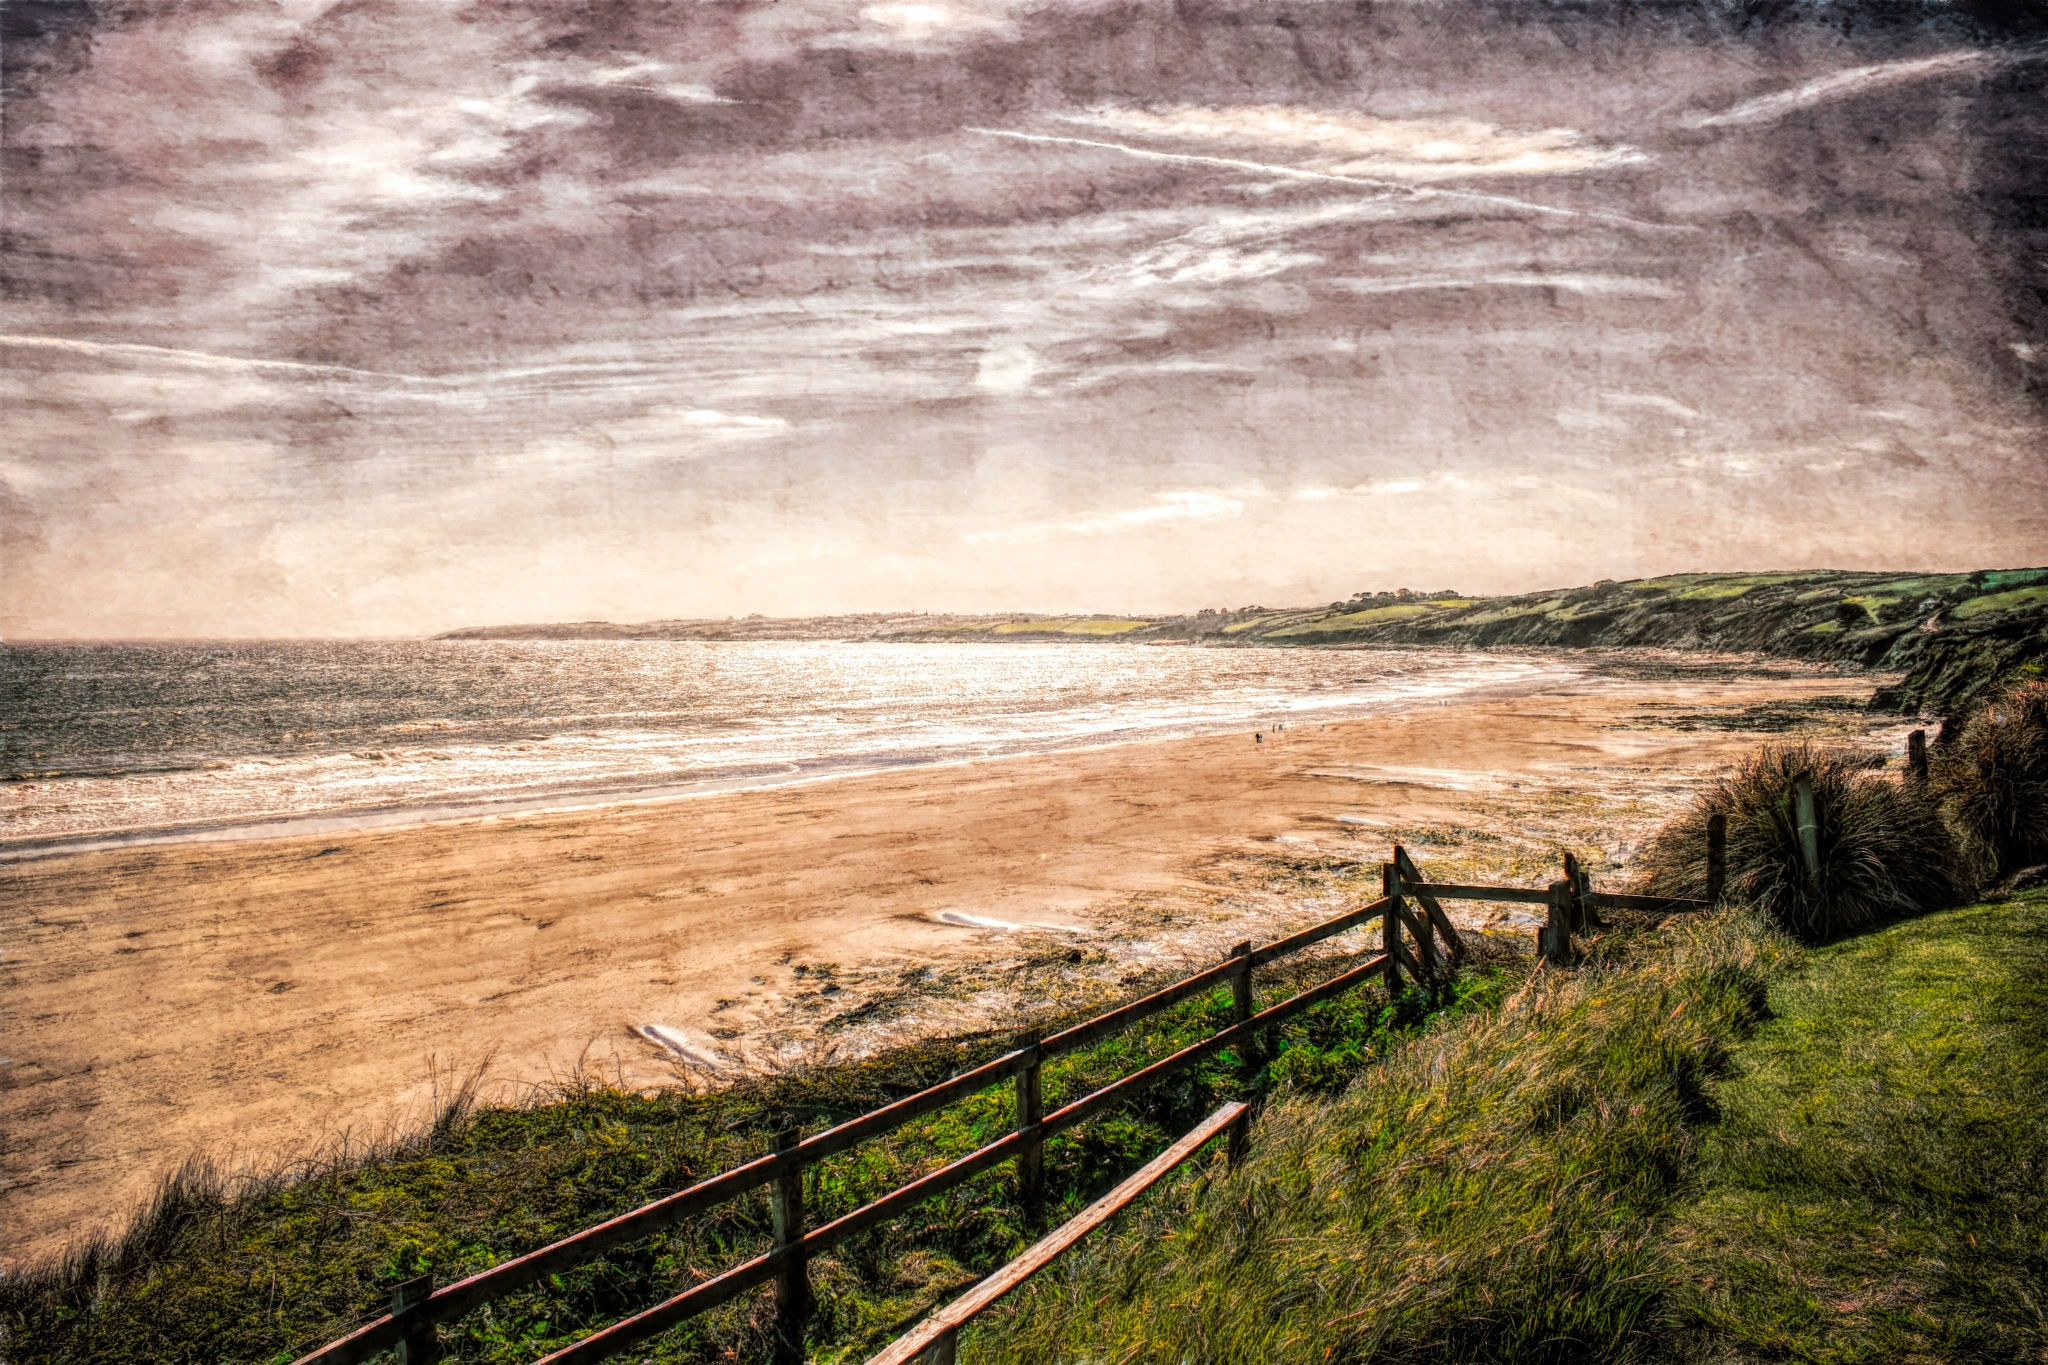 Carne Beach 2 by stephen.harding.735